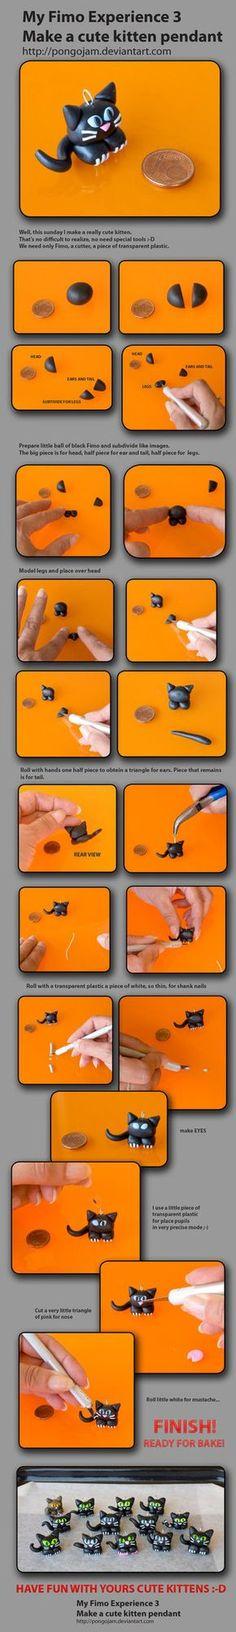 Make cute kitten FIMO TUTORIAL by *pongojam on deviantART